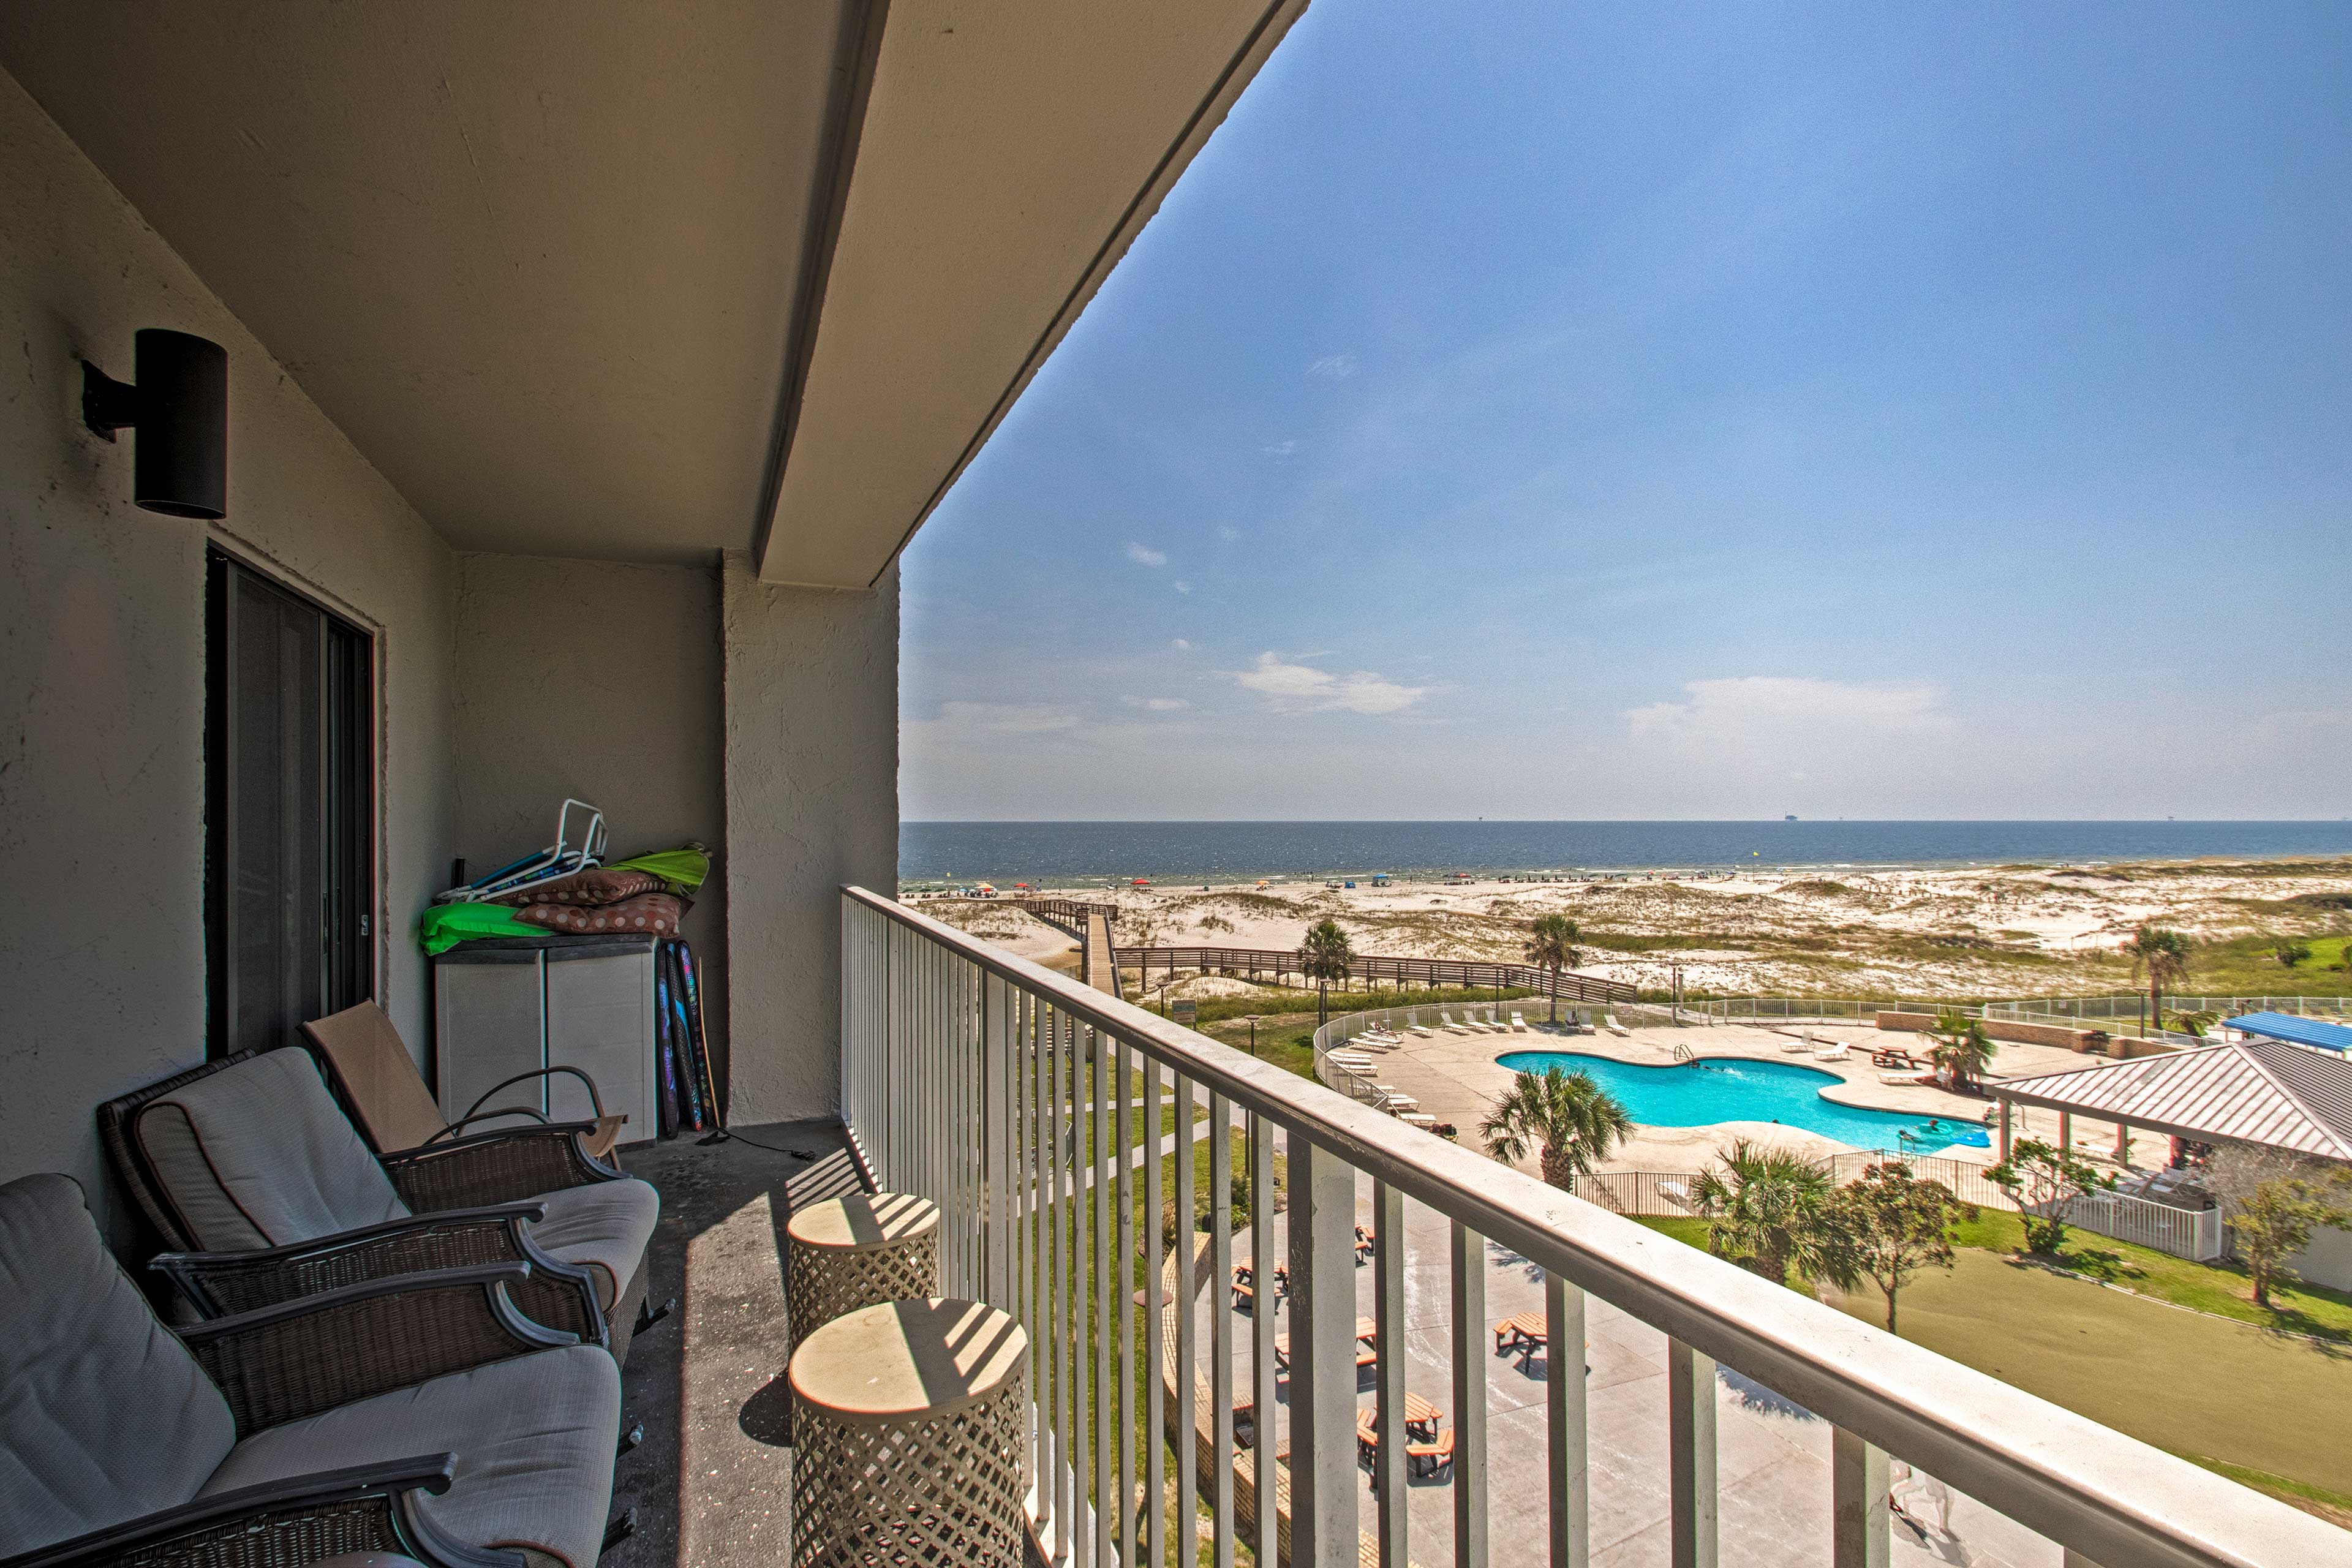 Gulf Shores Vacation Rental | 2BR | 2BA | Elevator Access